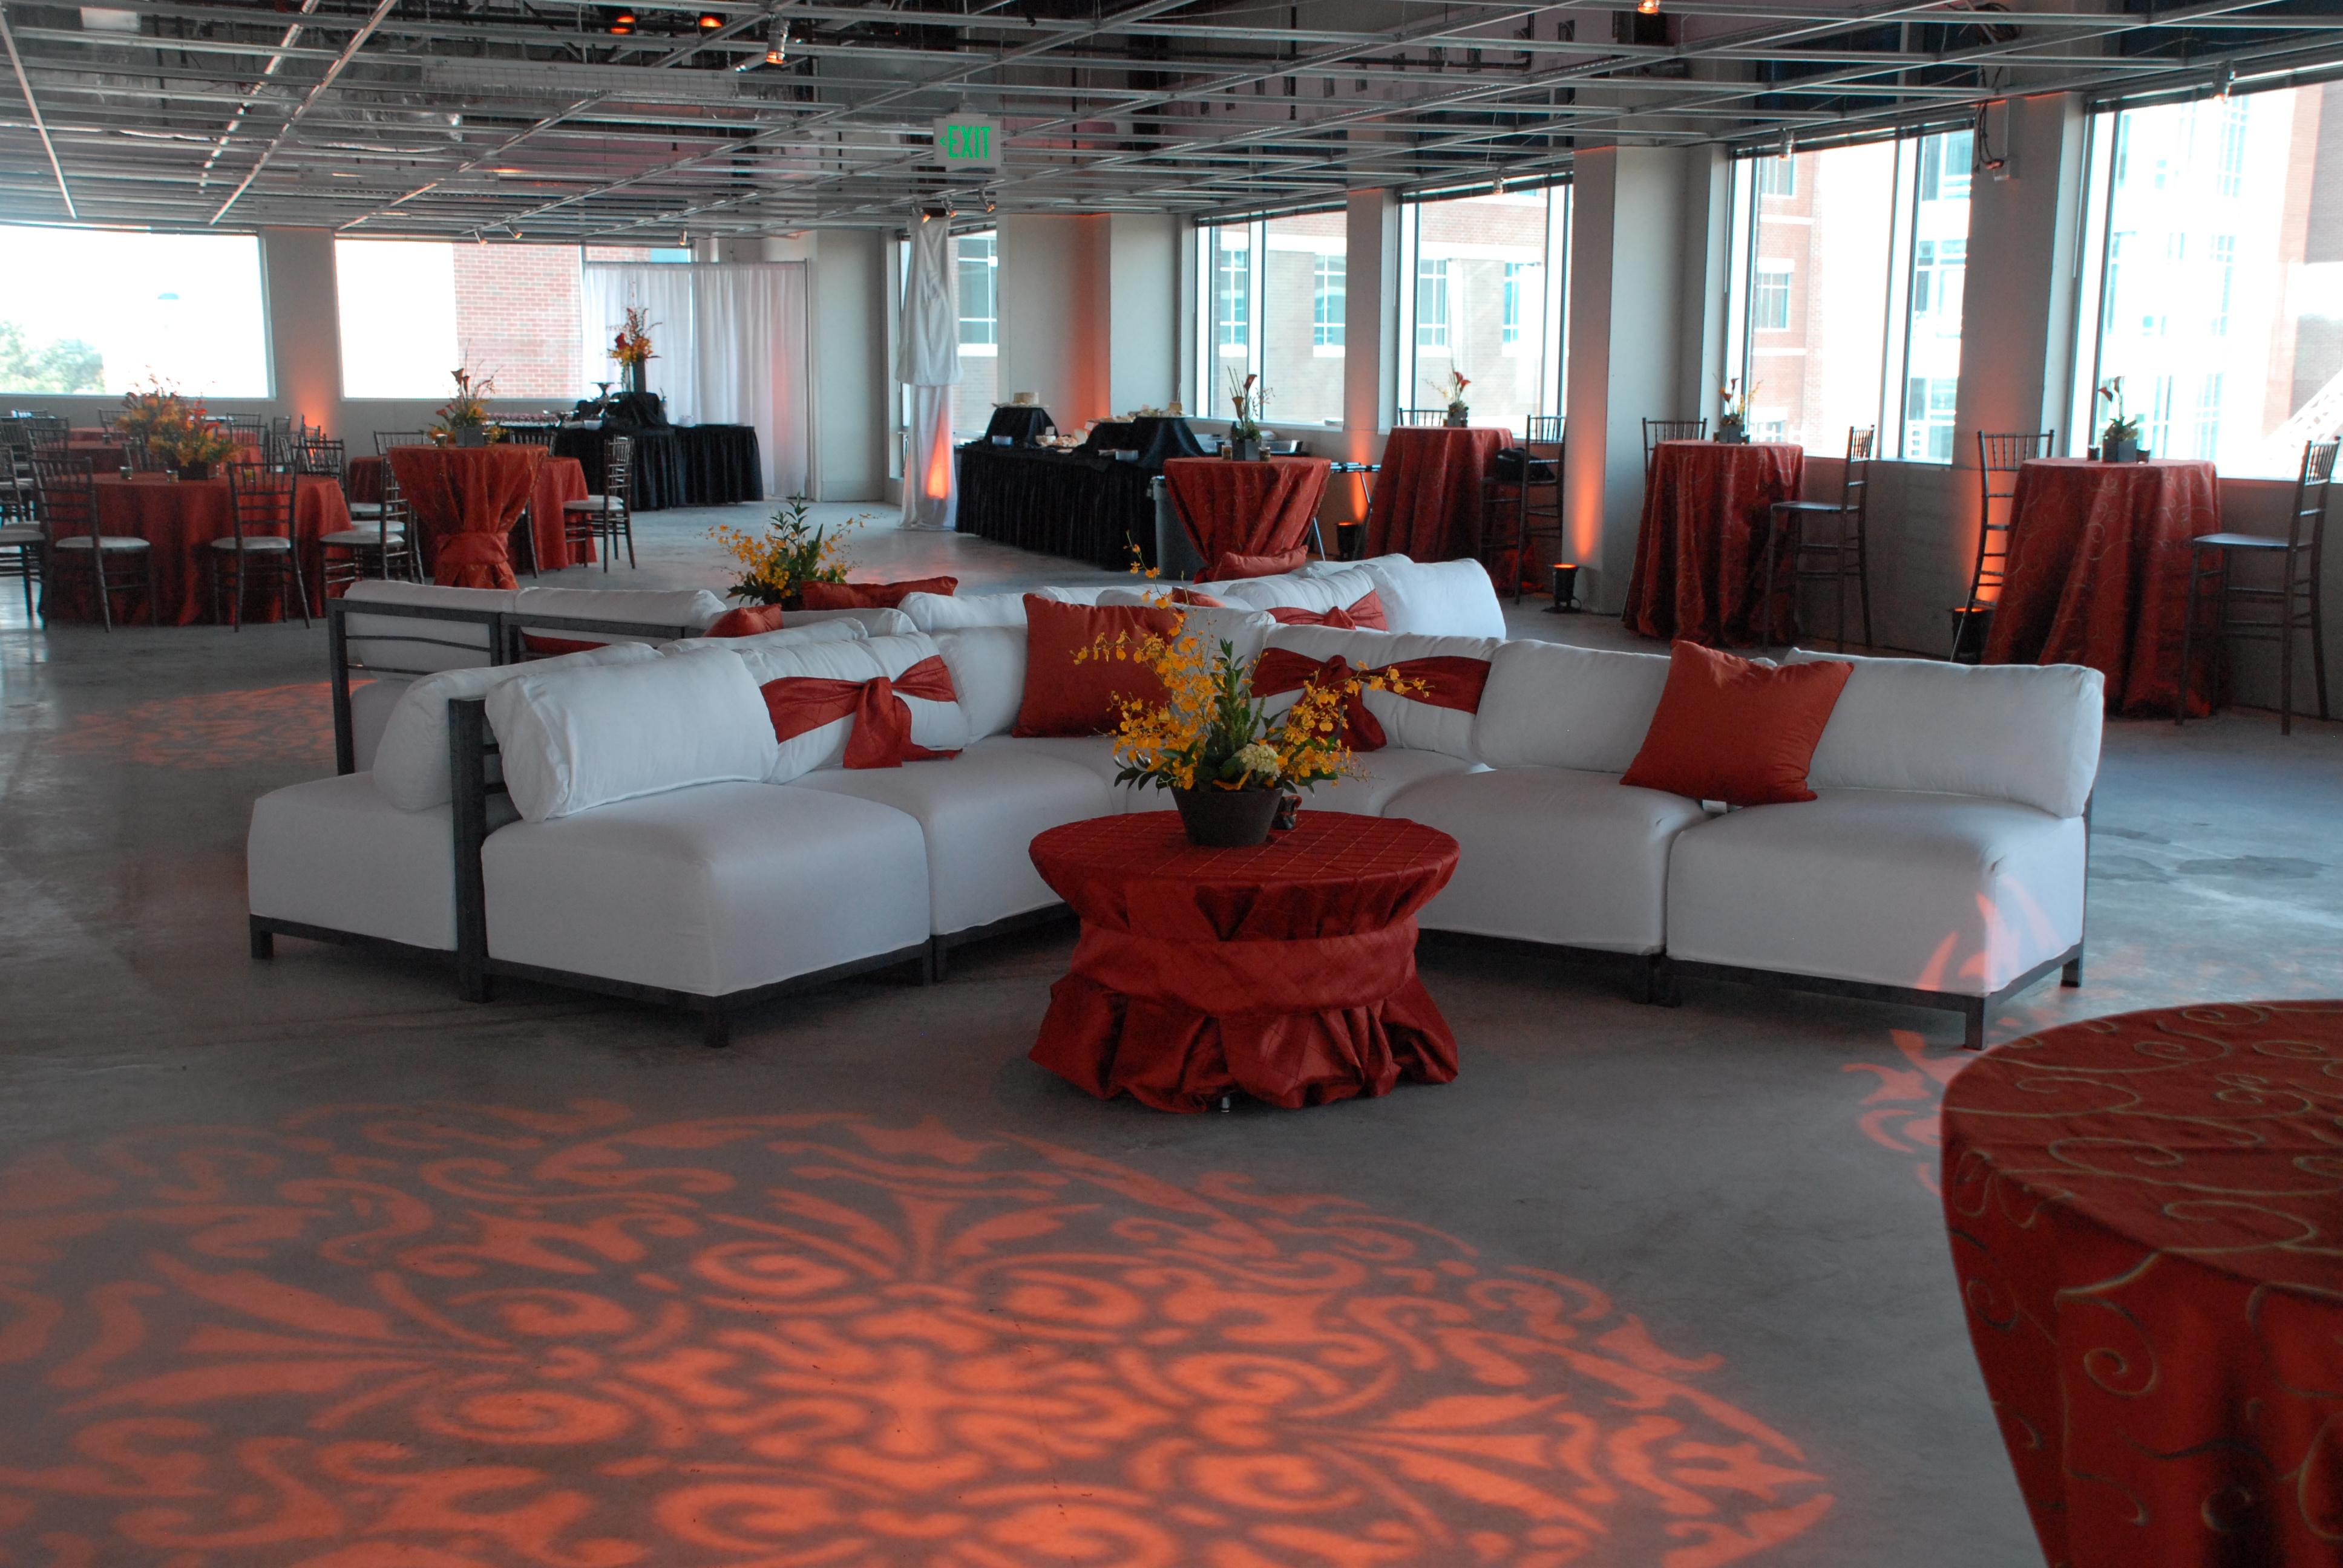 Cort Furniture Lavergne Tn Mboro Rentals Murfreesboro Tn Event Rentals In Cort Nashville Net